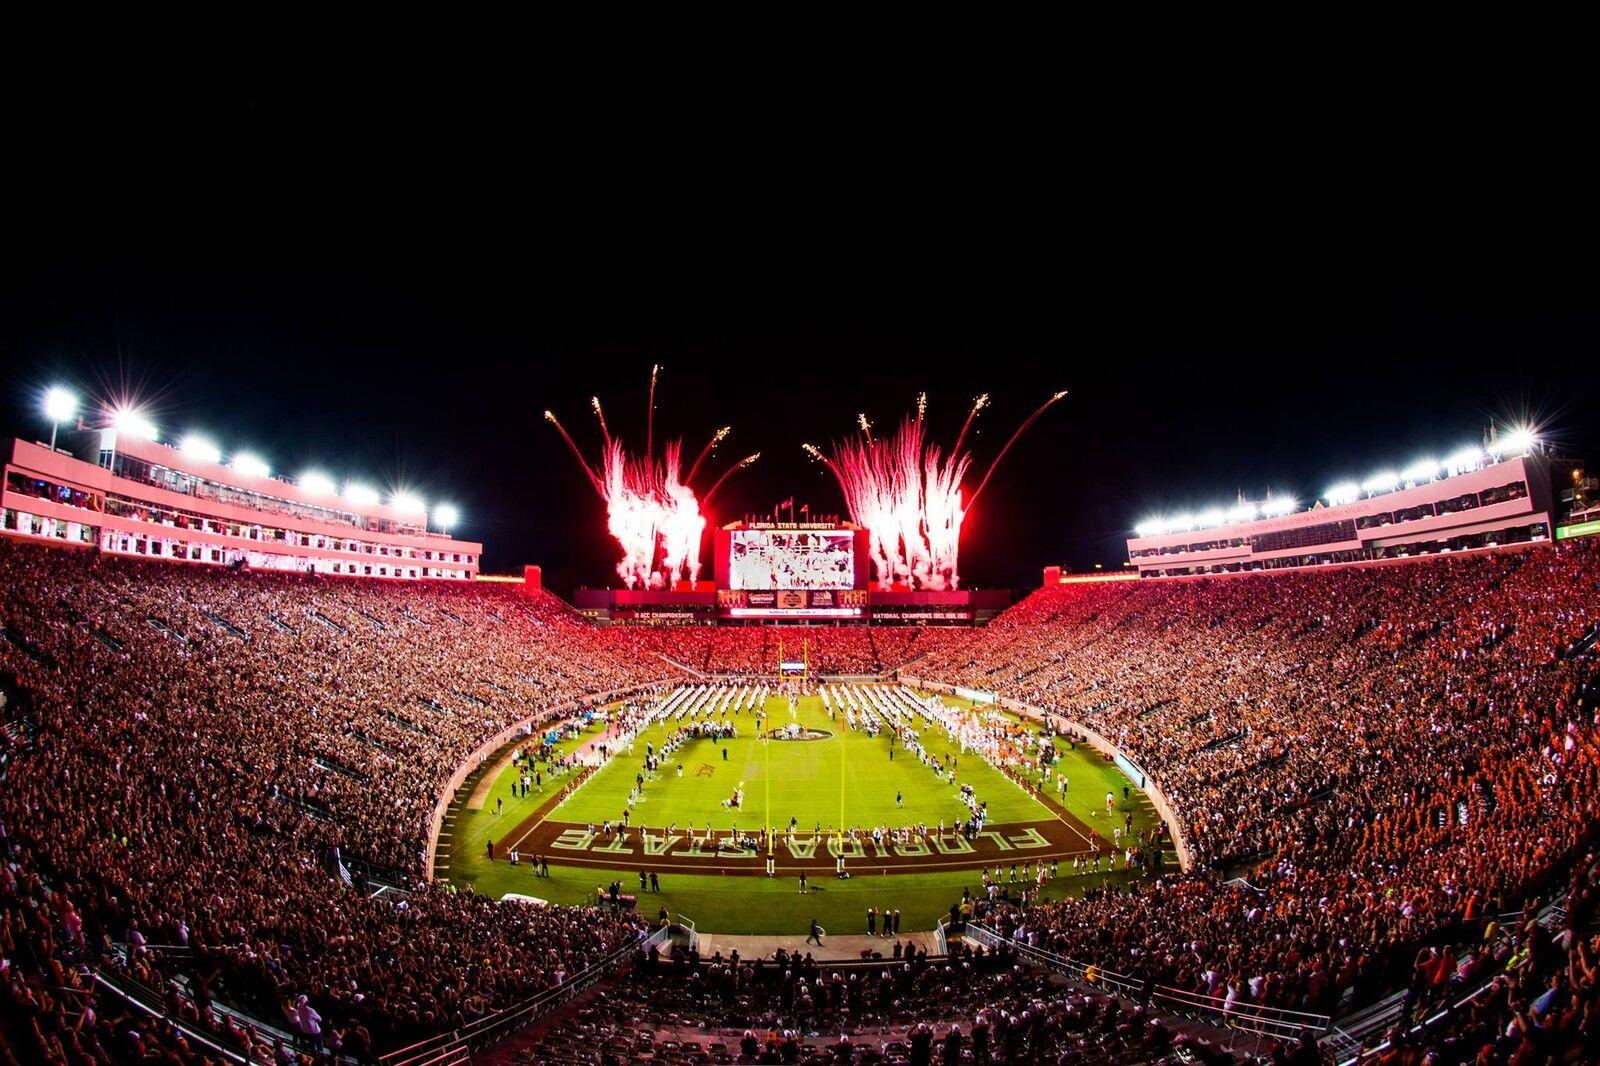 Florida State University Football >> Florida State Football tickets - Florida State Seminoles Football tickets on StubHub!